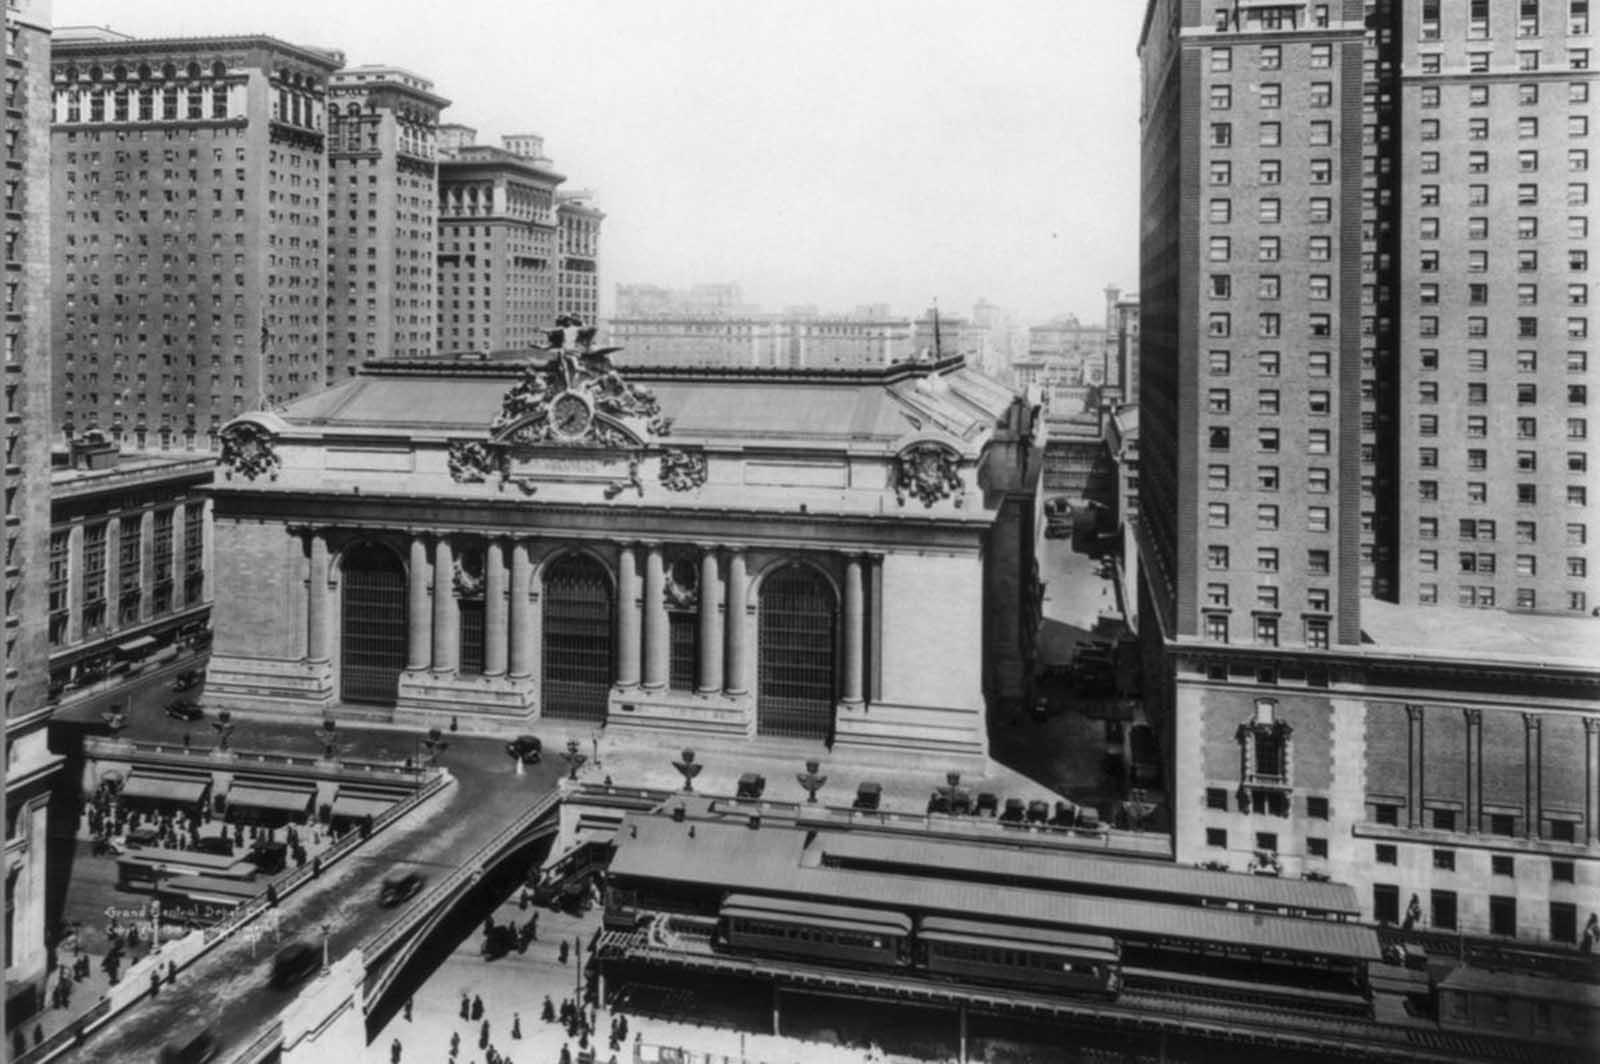 Grand Central Terminal, en Vanderbilt Ave y 42nd St., ca 1919.